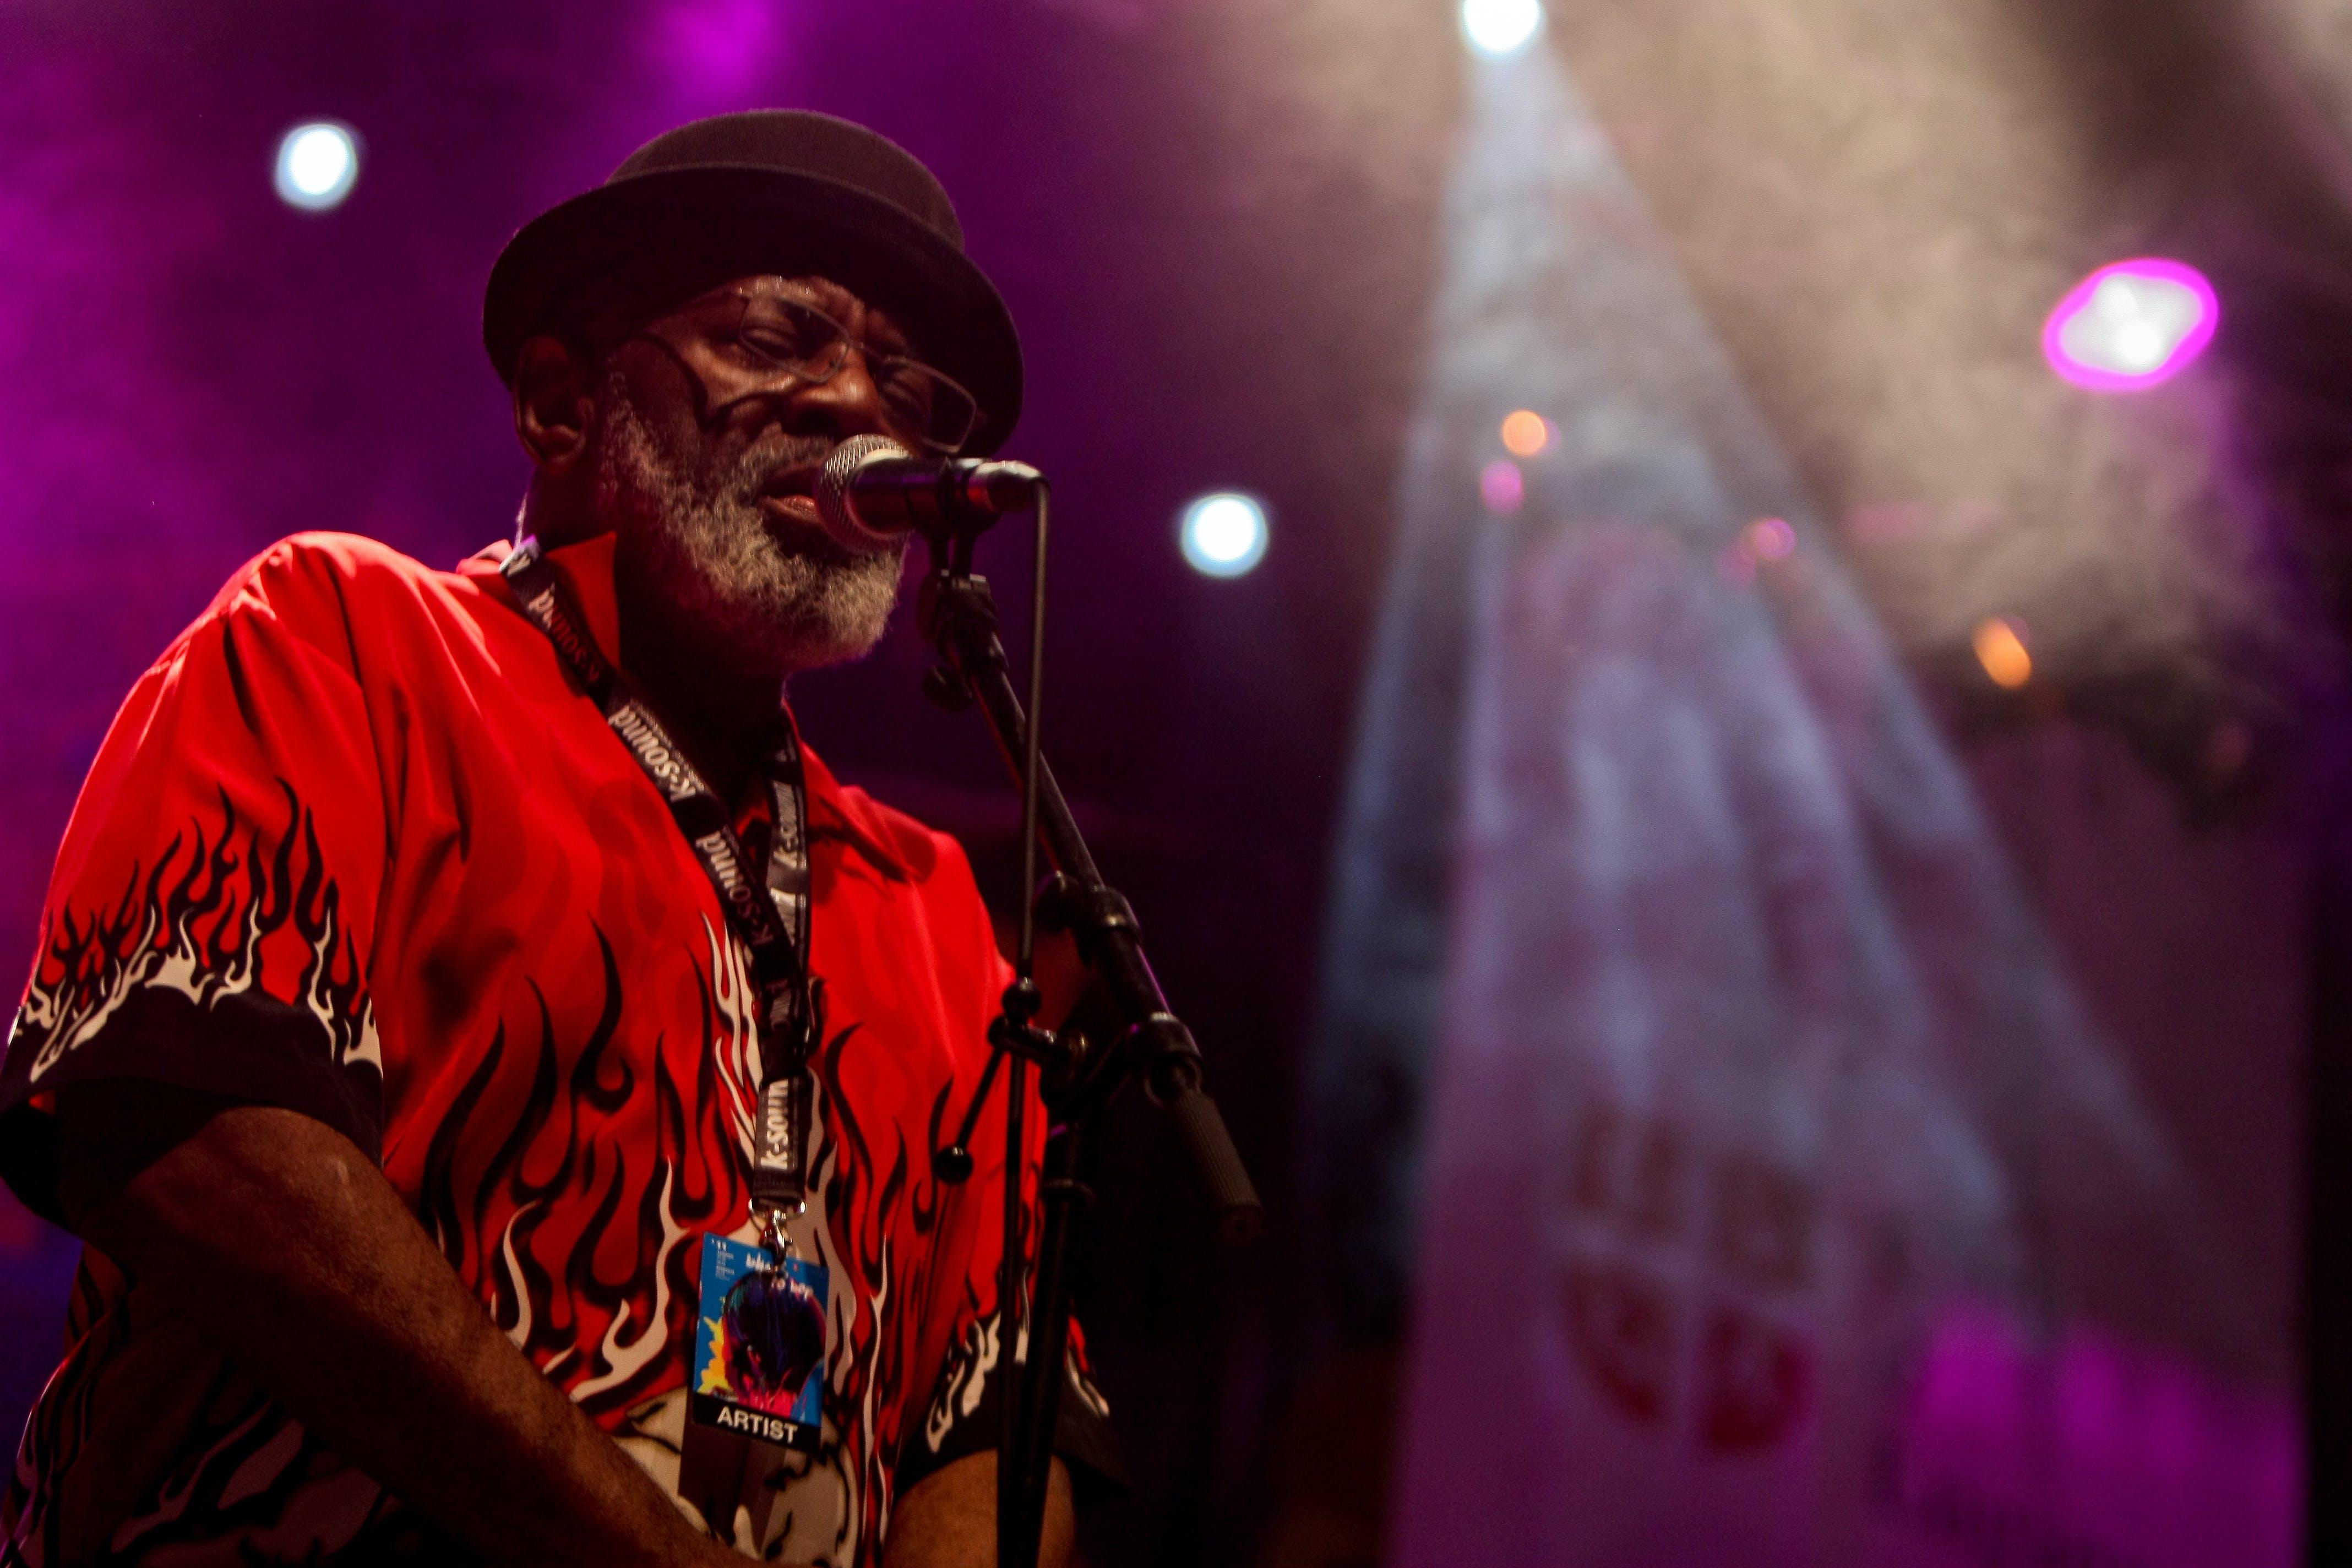 Close-Up Photo of Man Singing